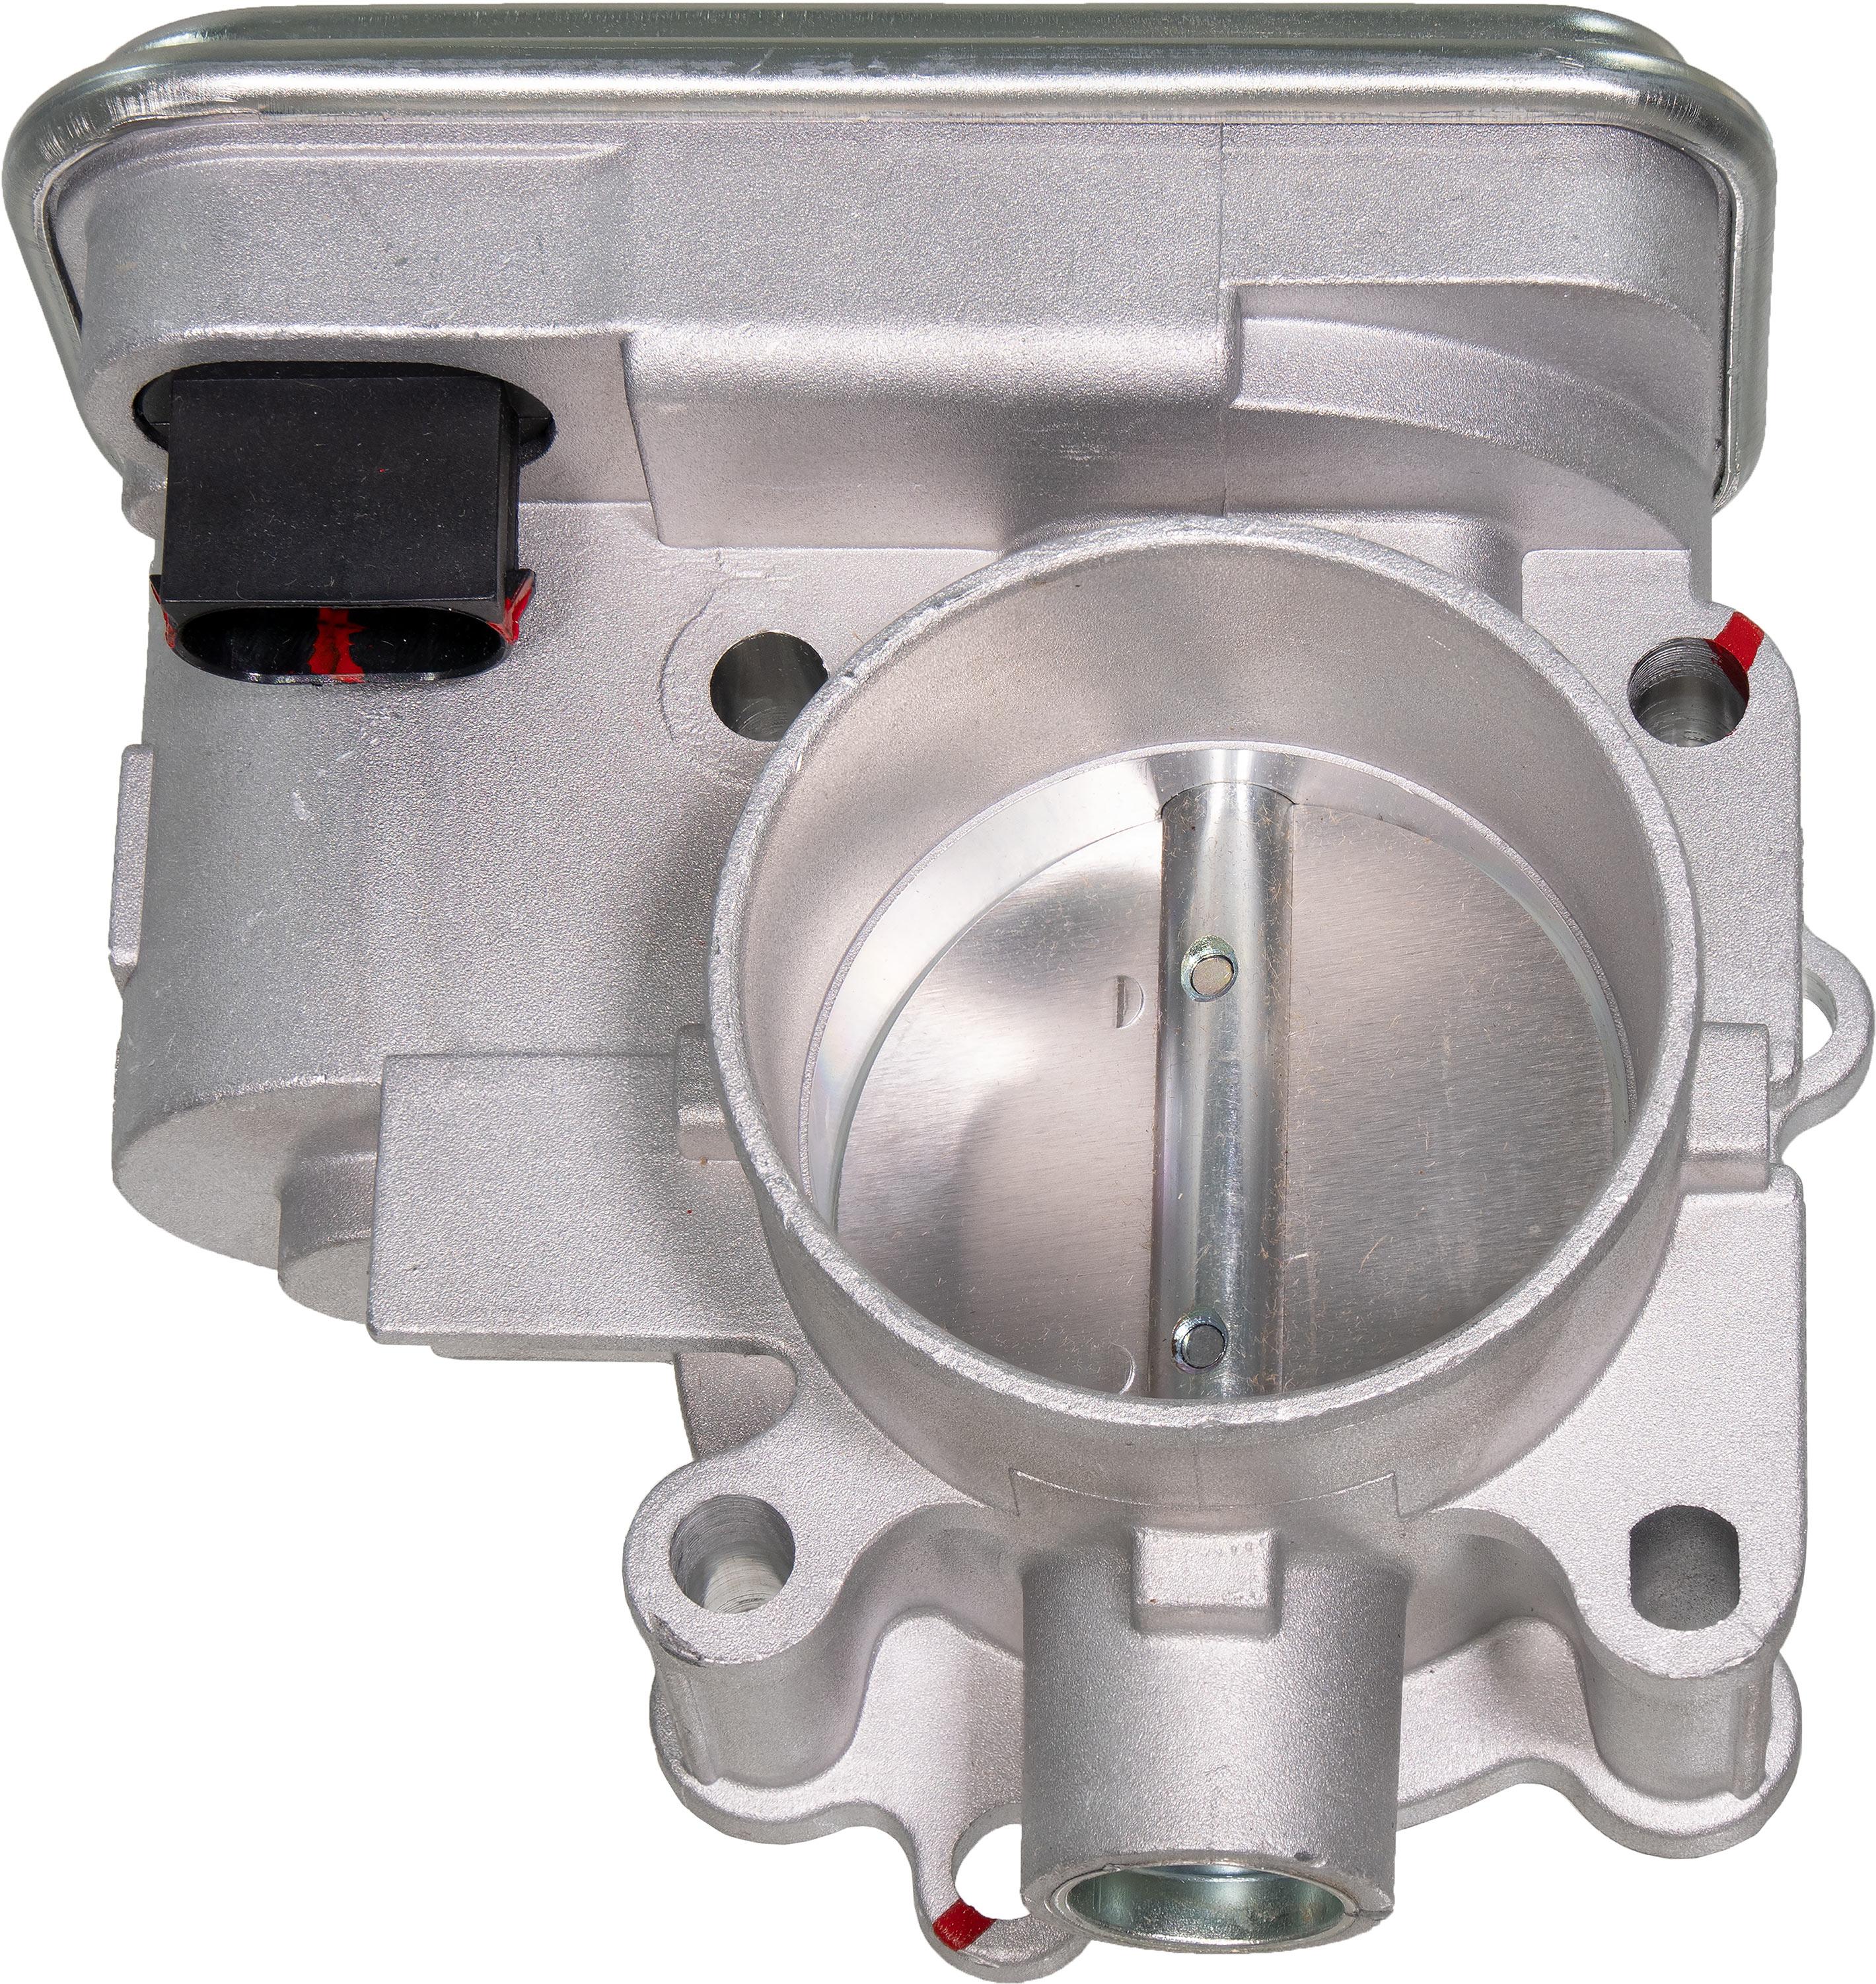 Throttle Position Sensor Jeep Patriot: APDTY 112542 Throttle Body Assembly W/Actuator IAC Idle